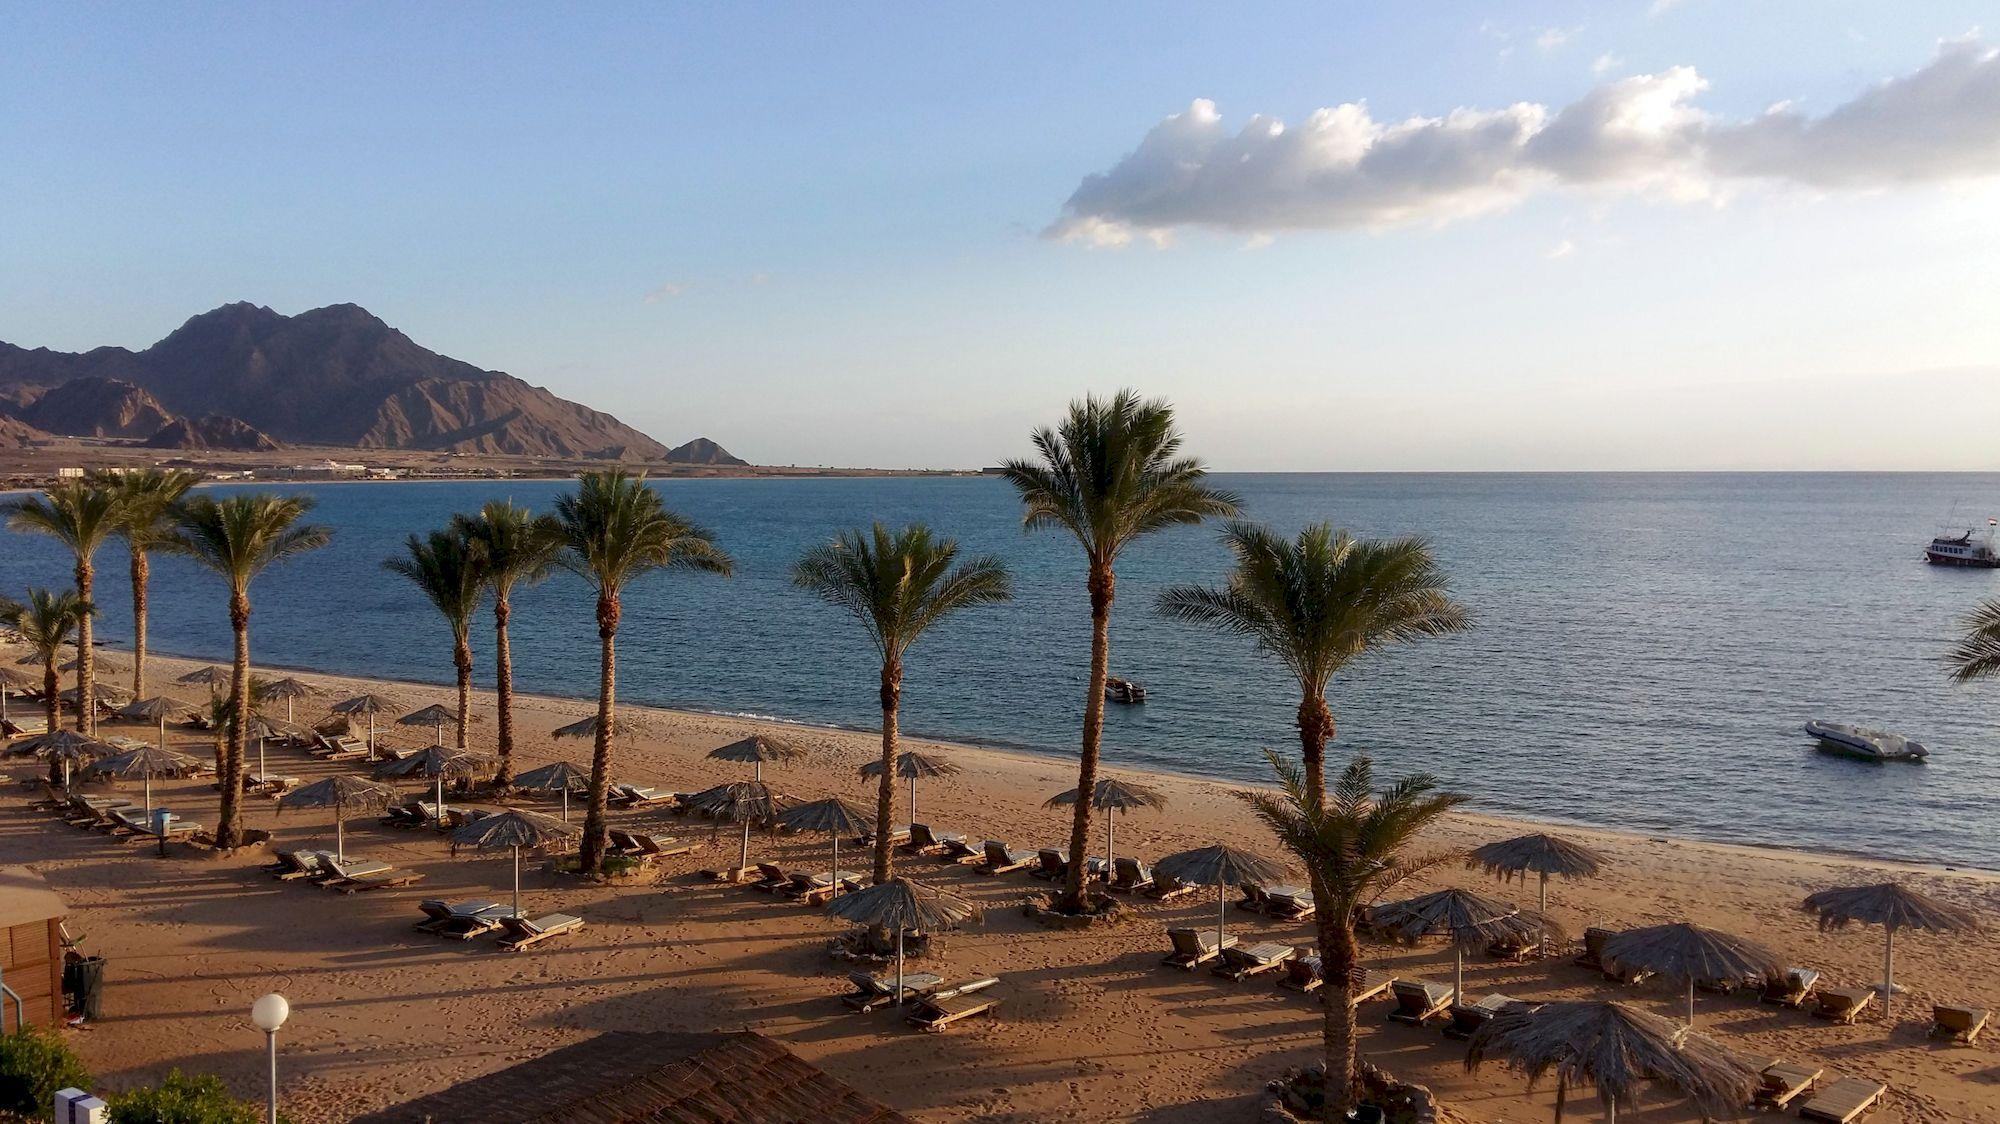 Hotelová pláž v Tabe